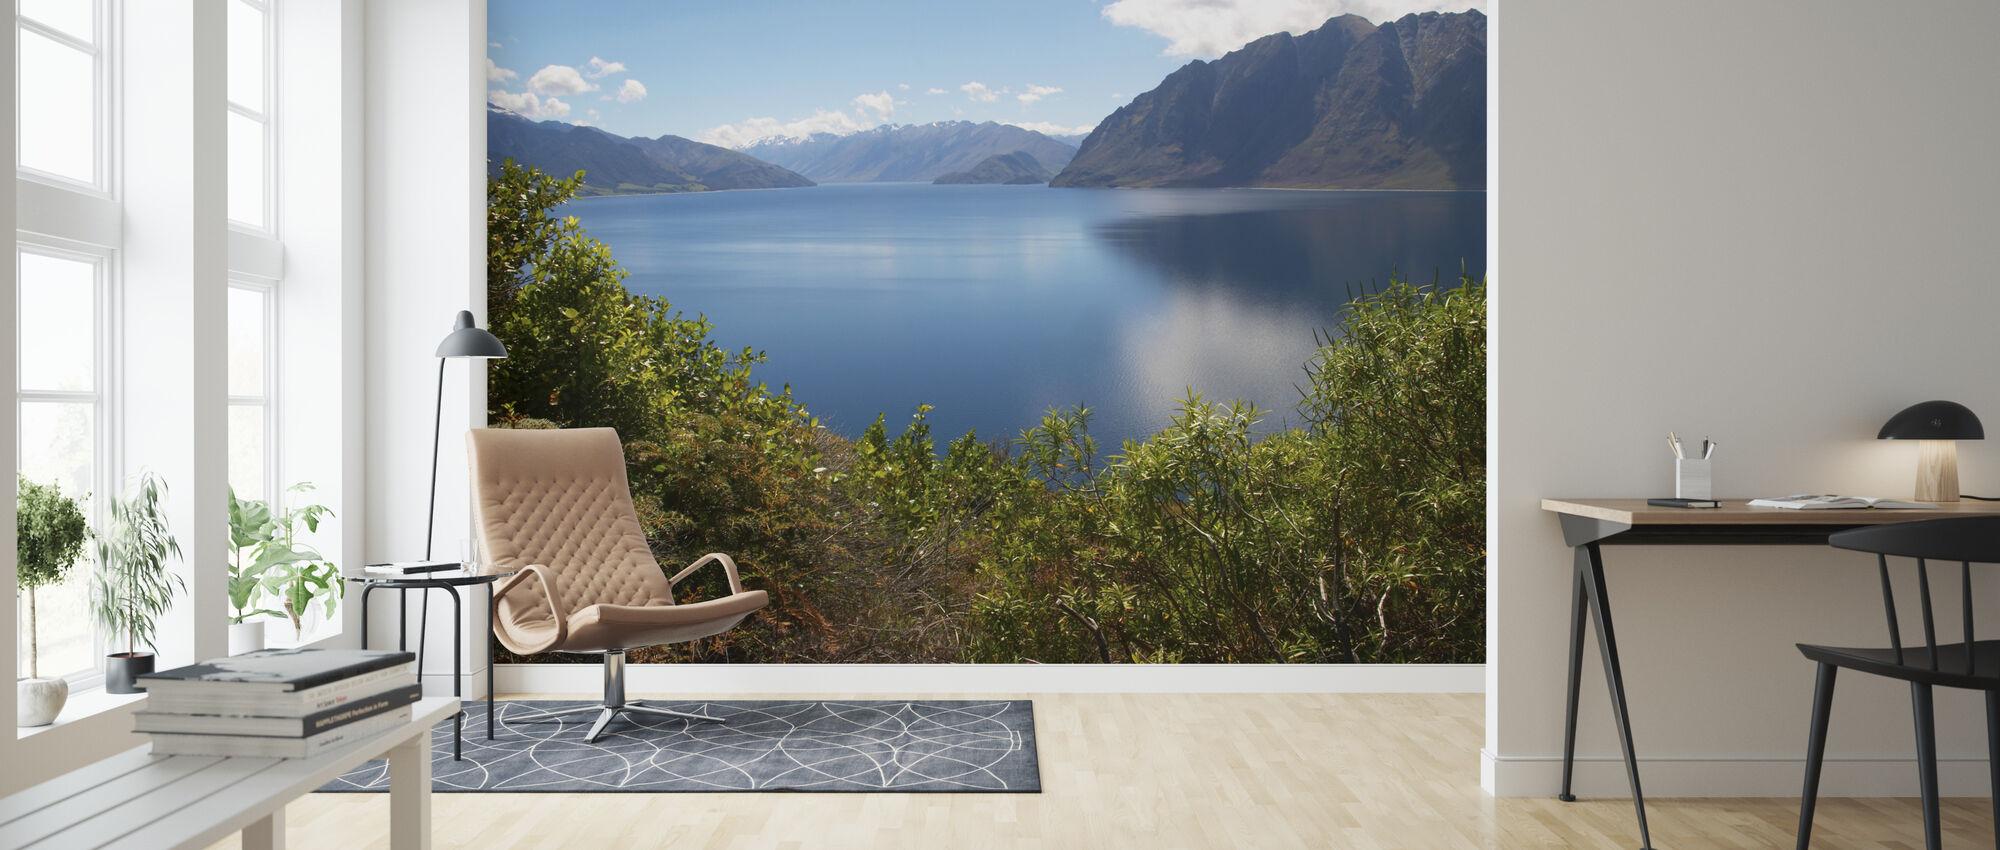 Nz Lake - Wallpaper - Living Room